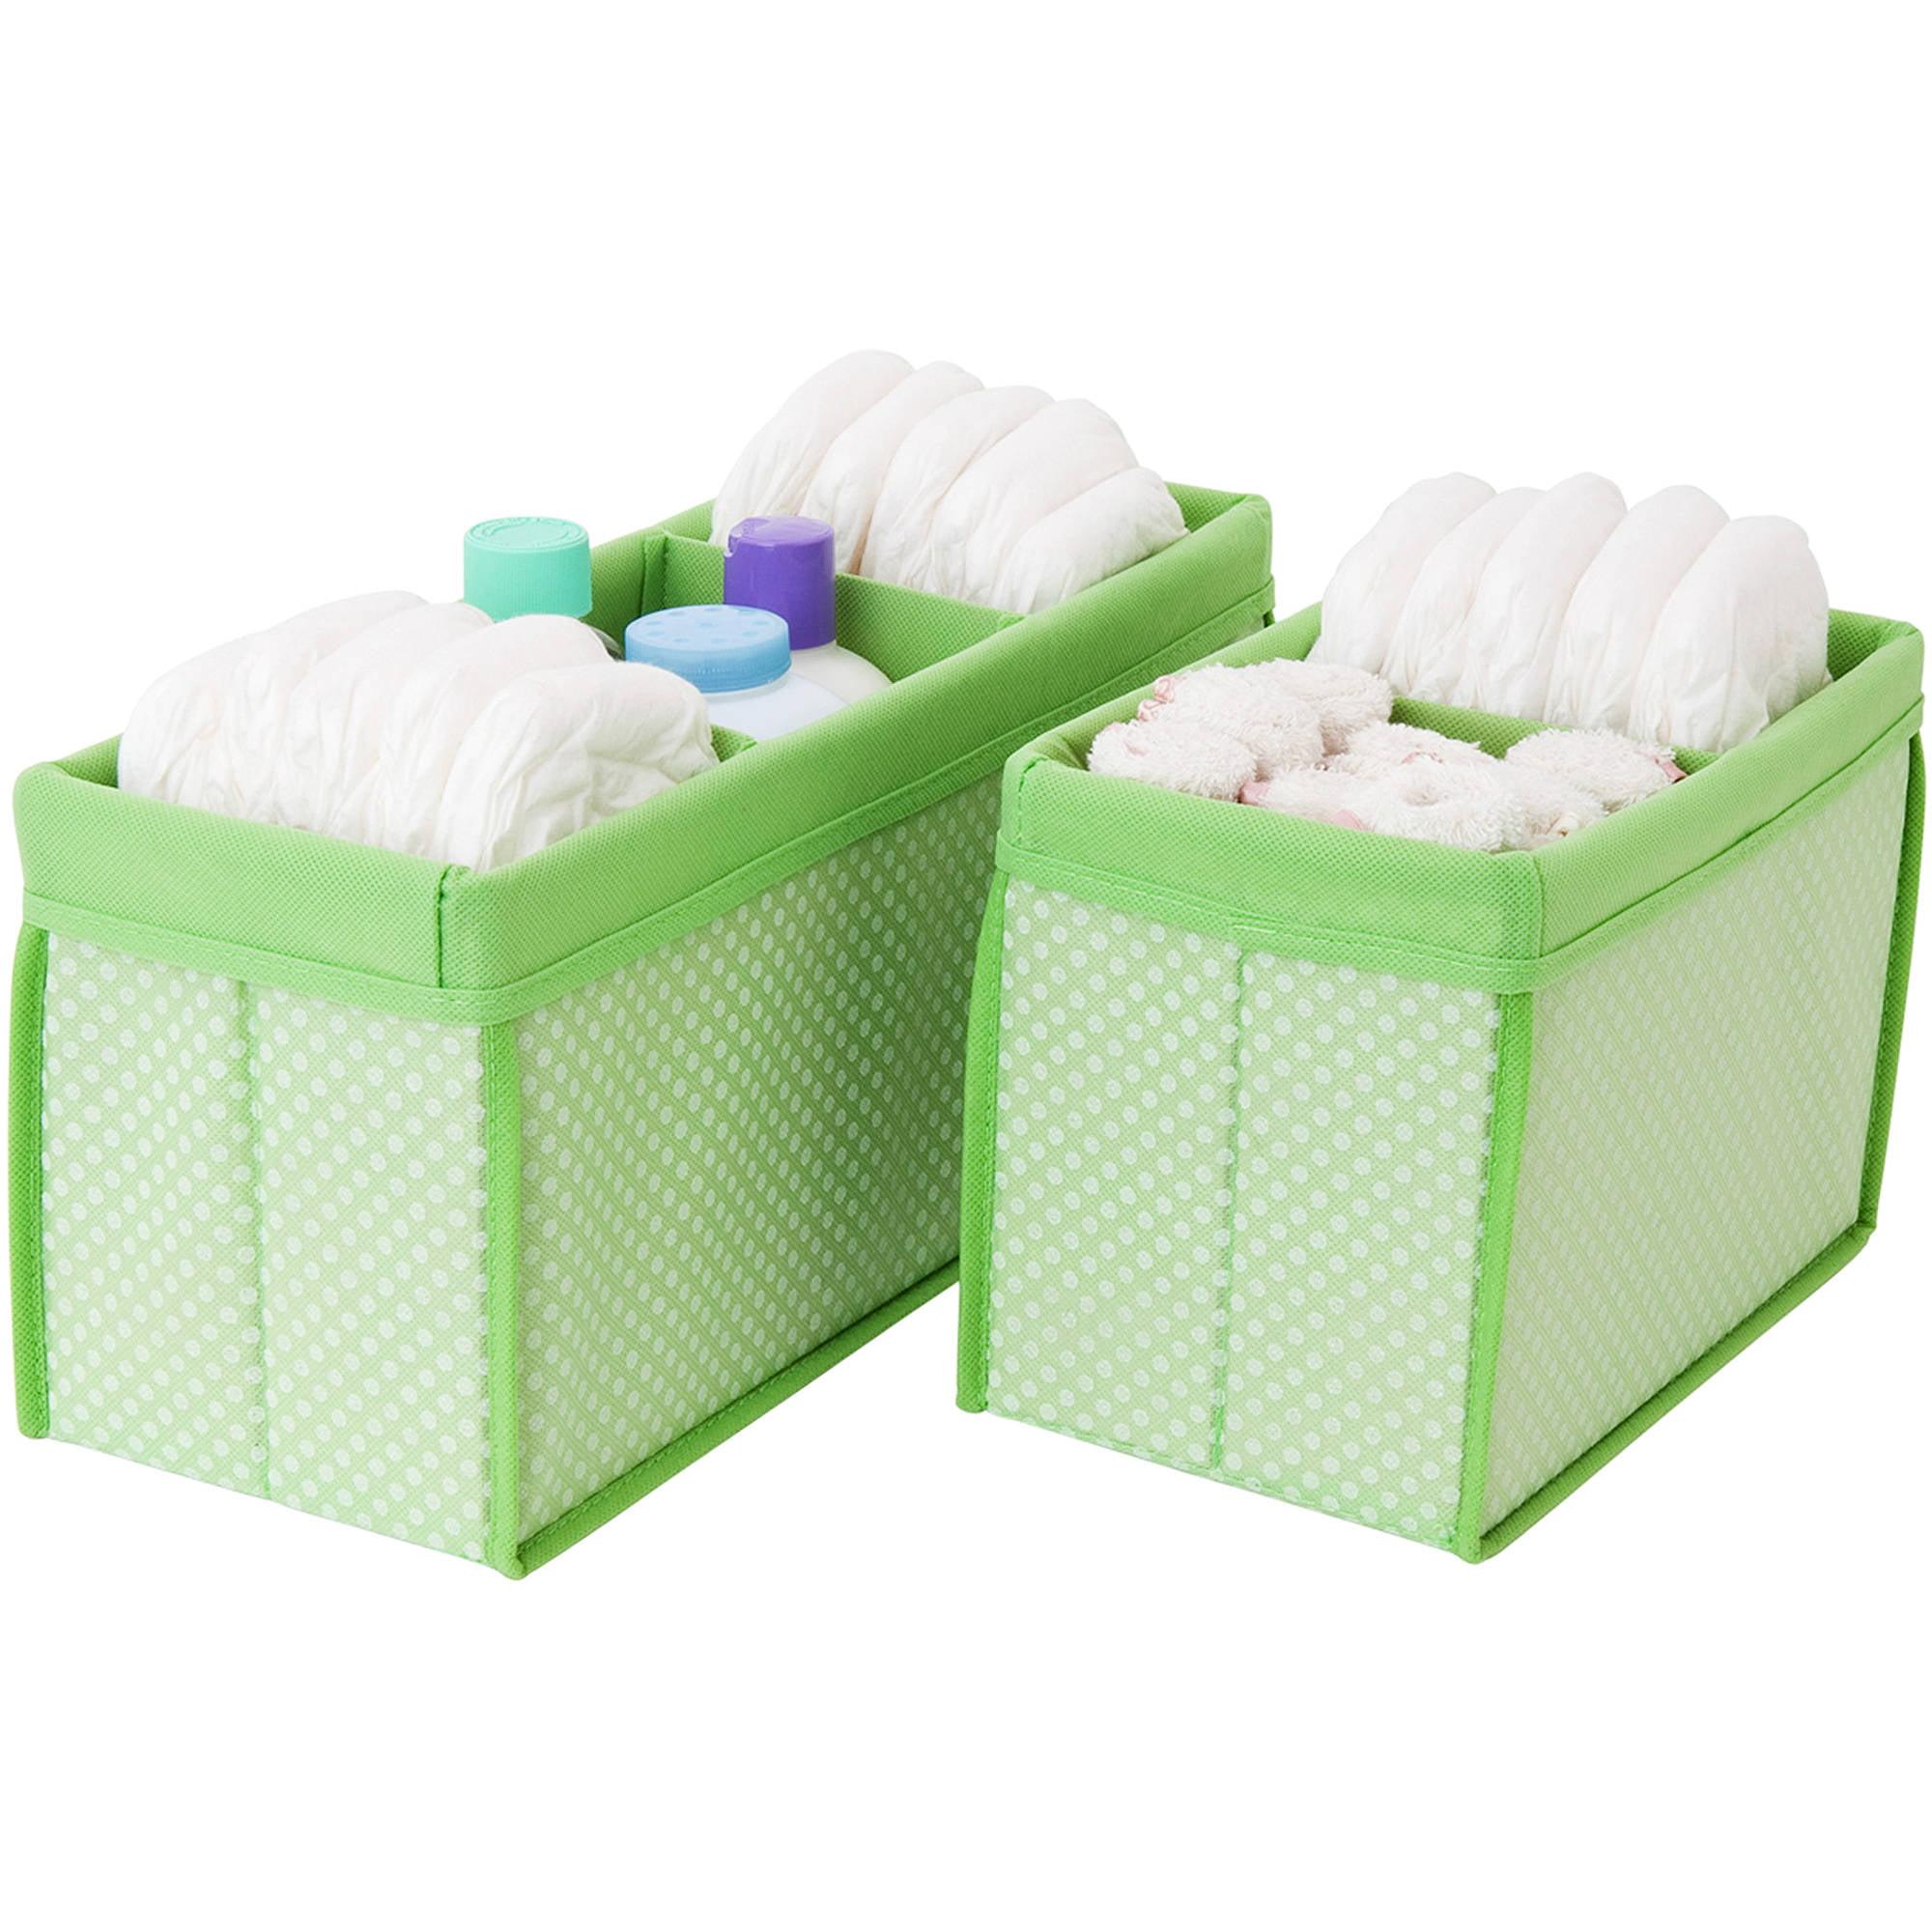 Nursery Organizer Bins, Set of 2, Hush Green